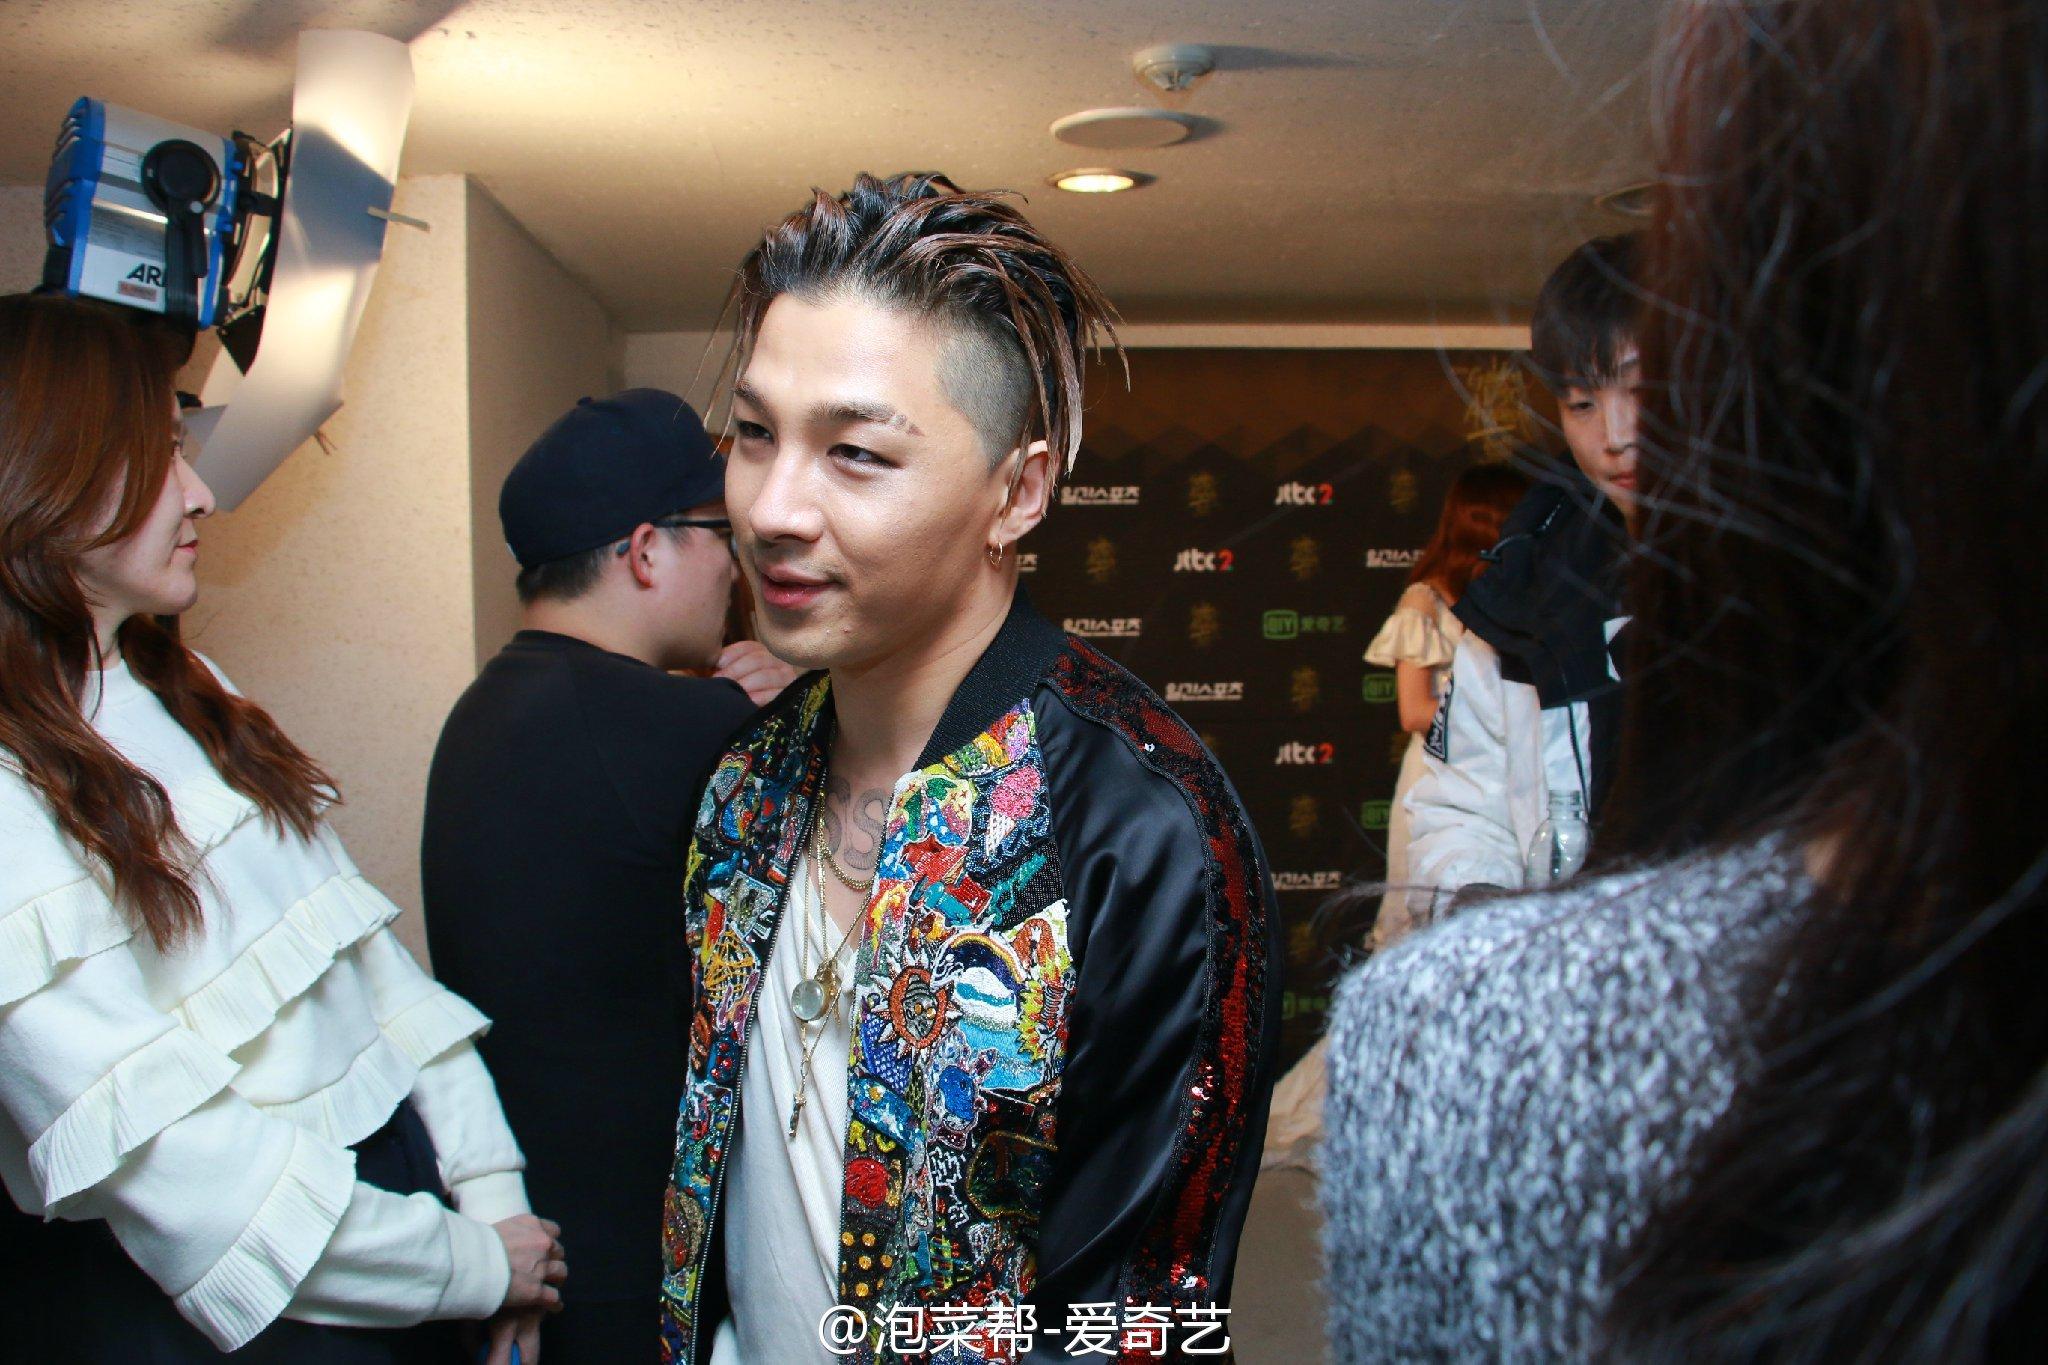 BIGBANG - Golden Disk Awards - Backstage - 20jan2016 - 泡菜帮-爱奇艺 - 08